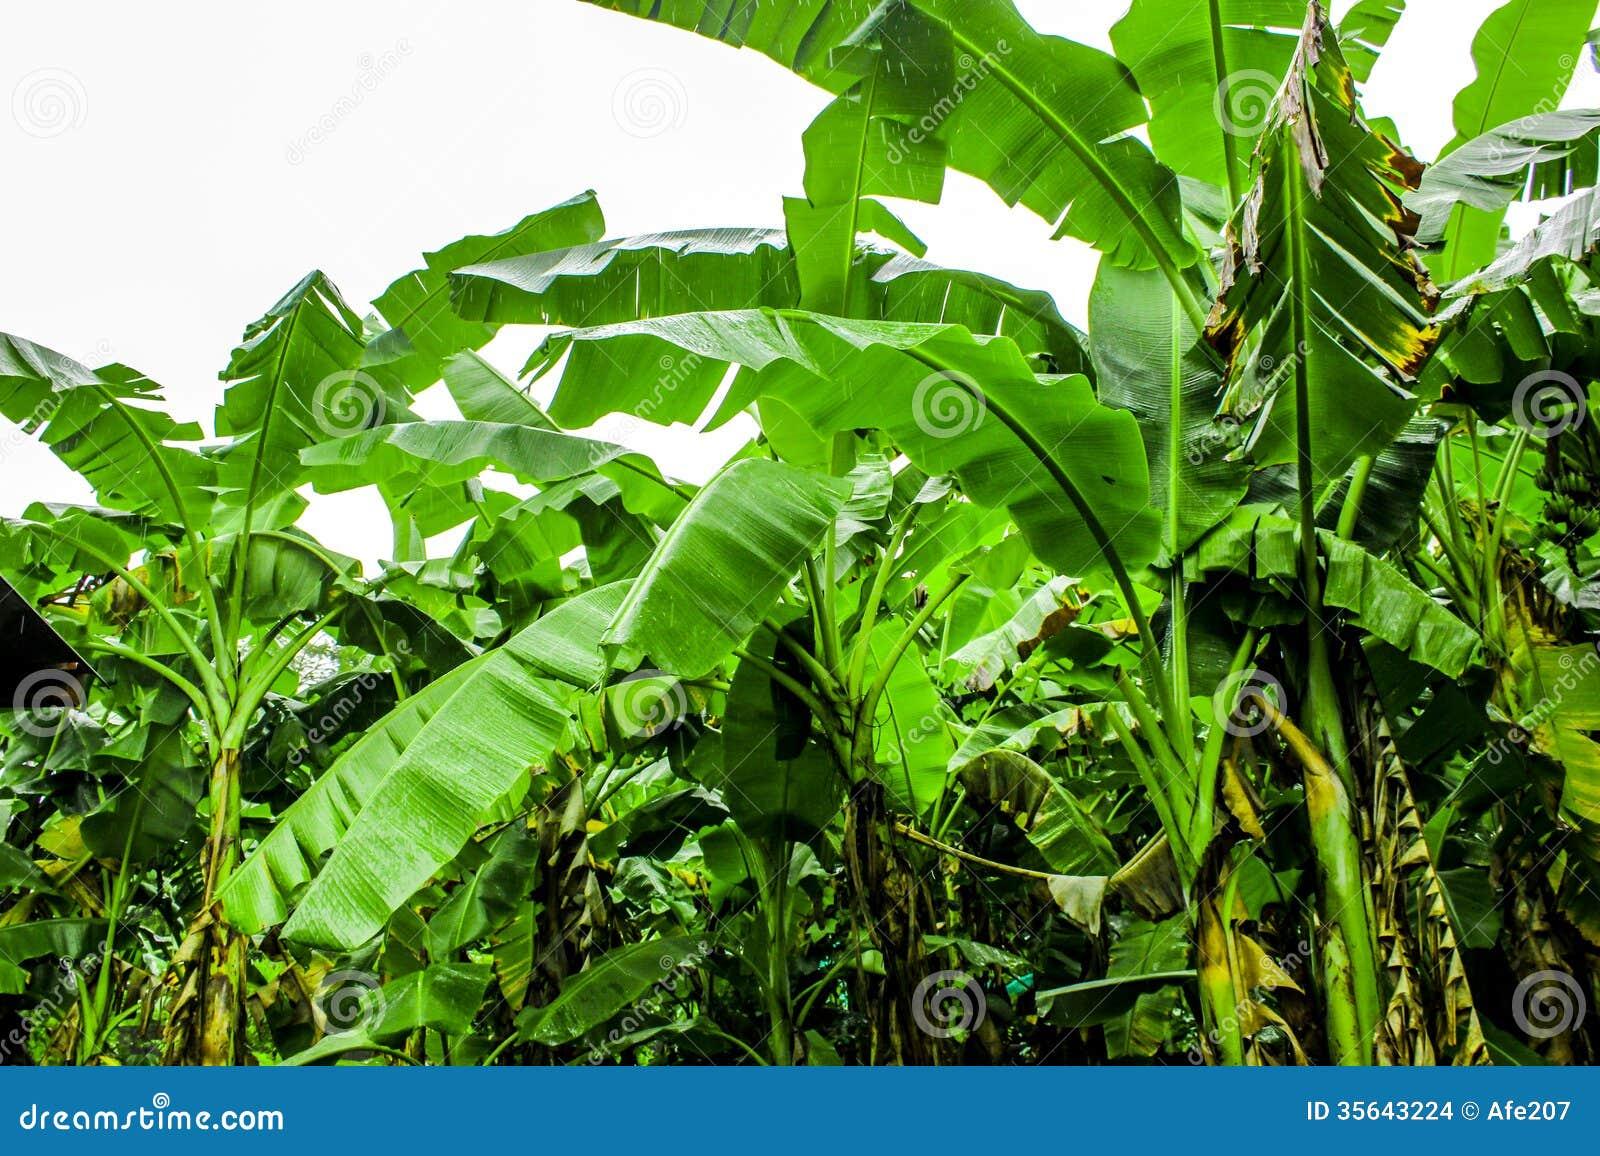 Doing banana farming as a business